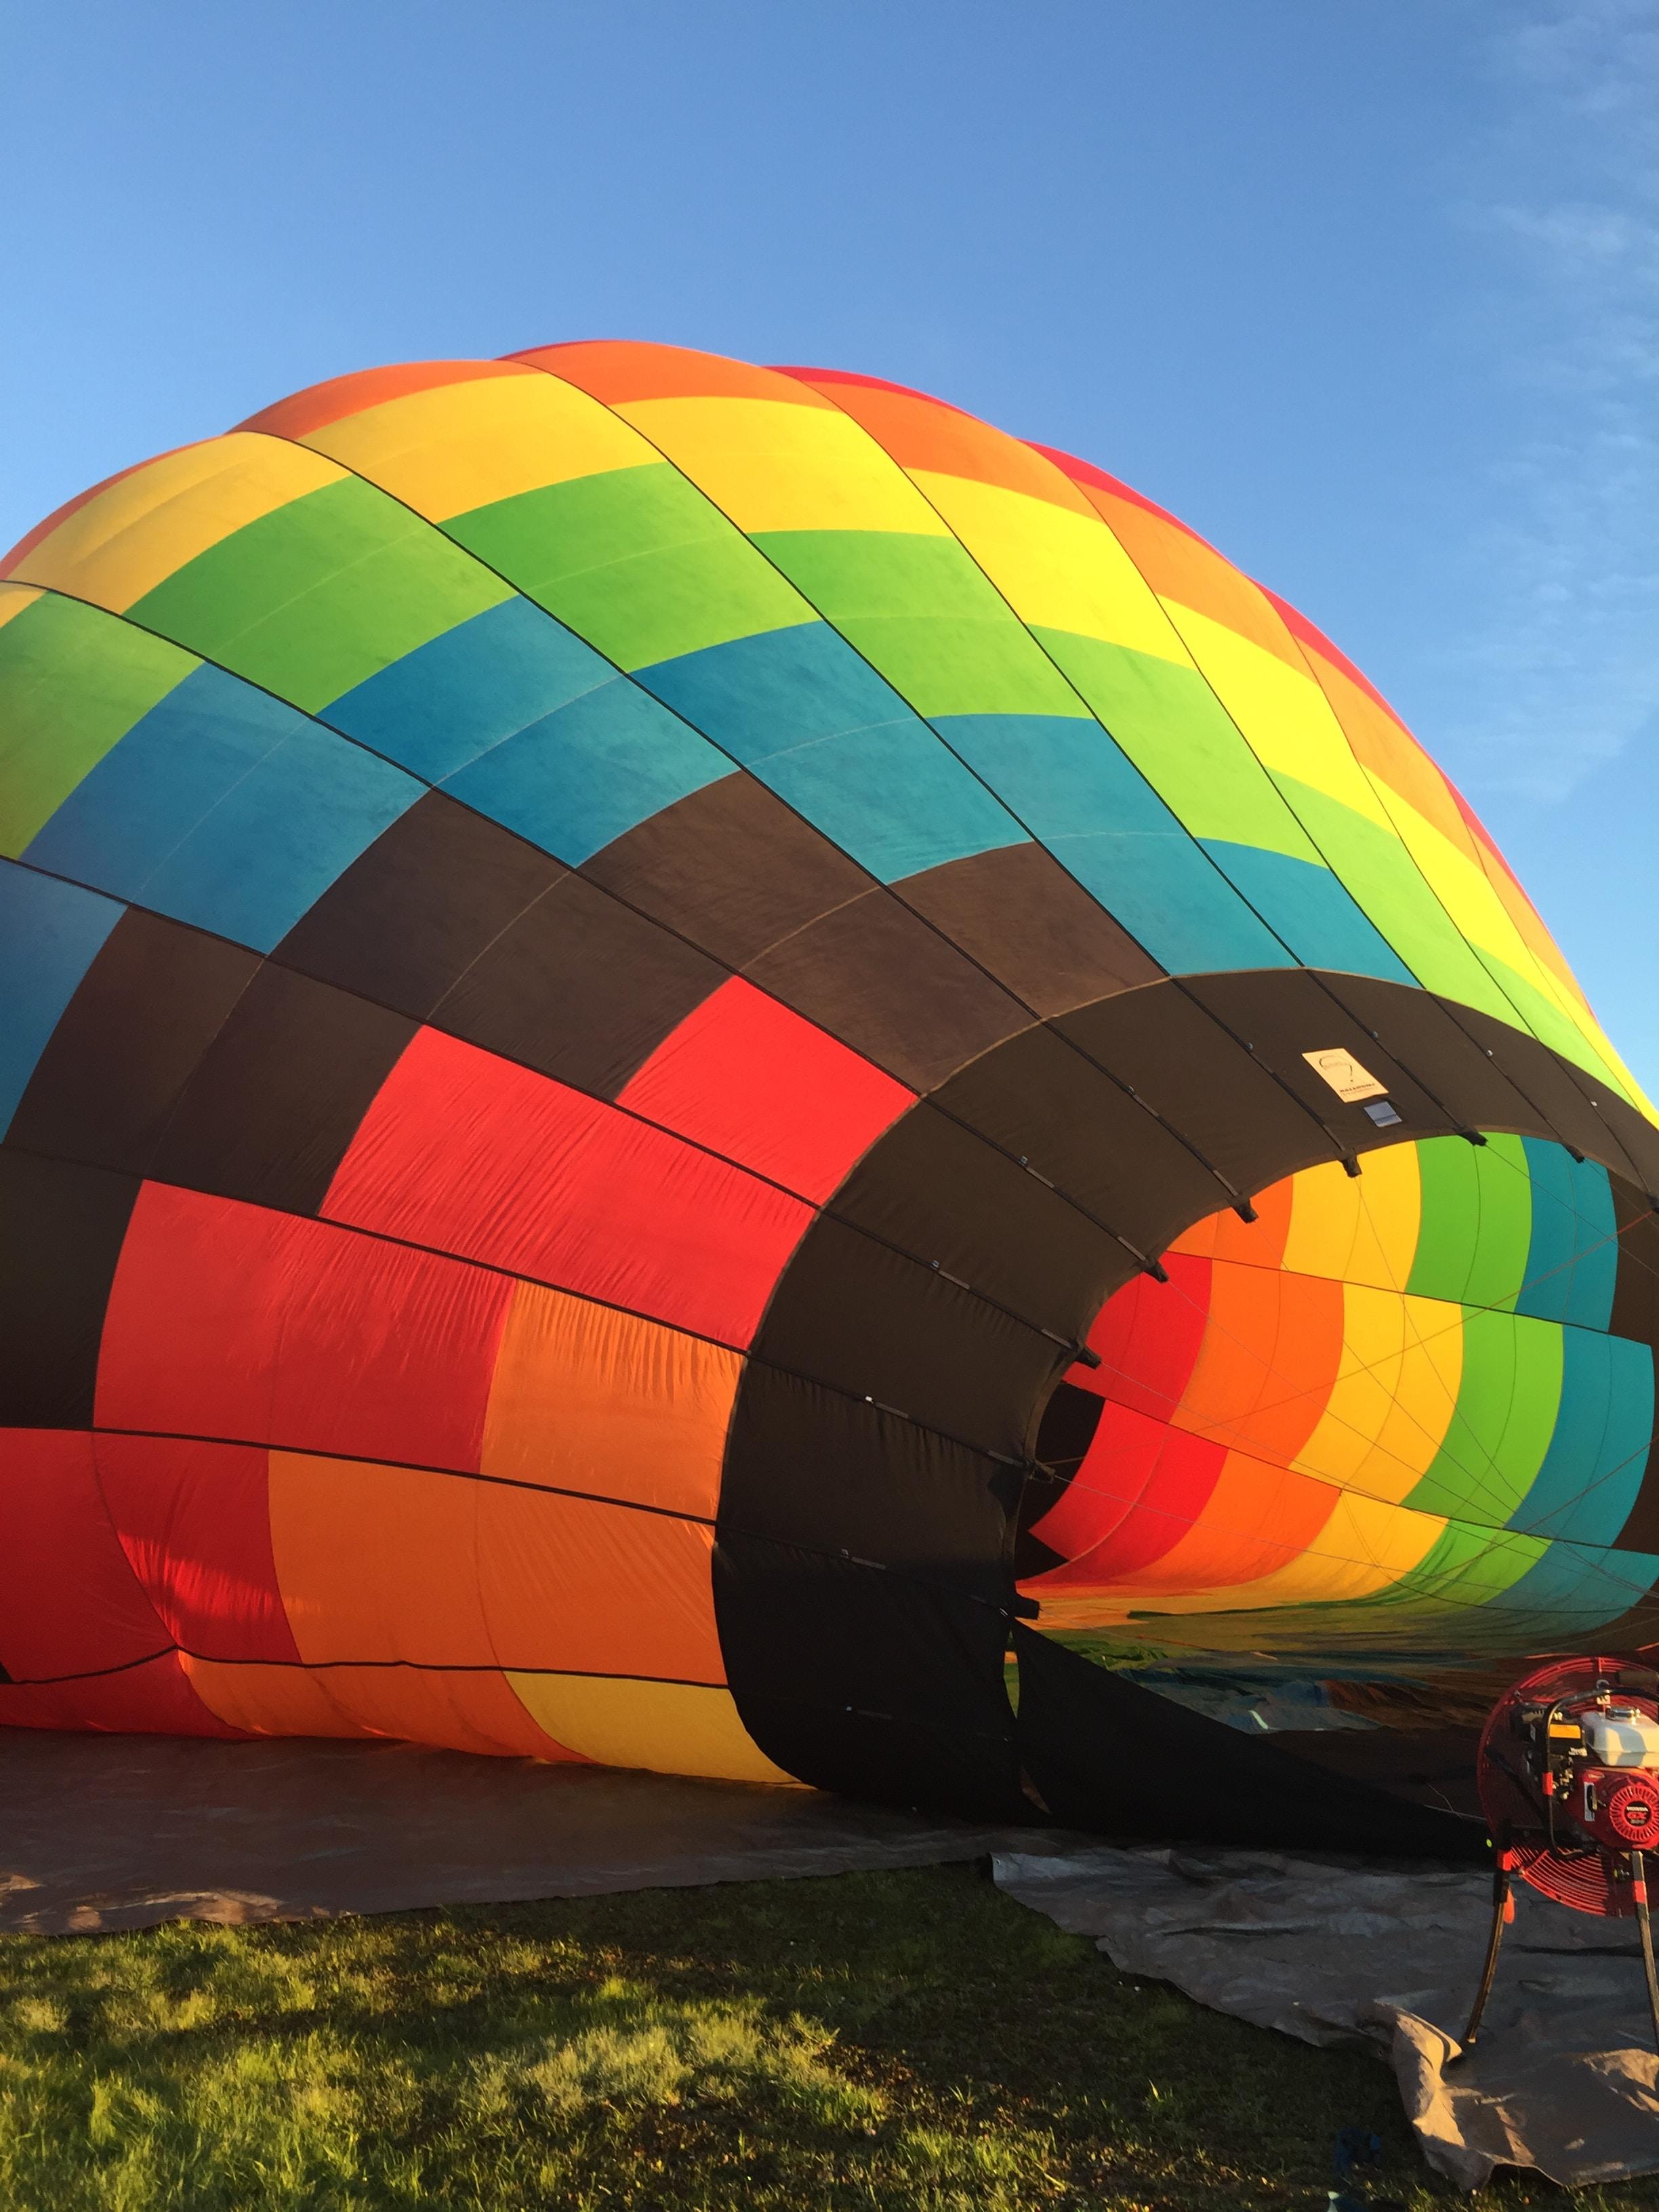 blue, green, and orange hot air balloon on grass field